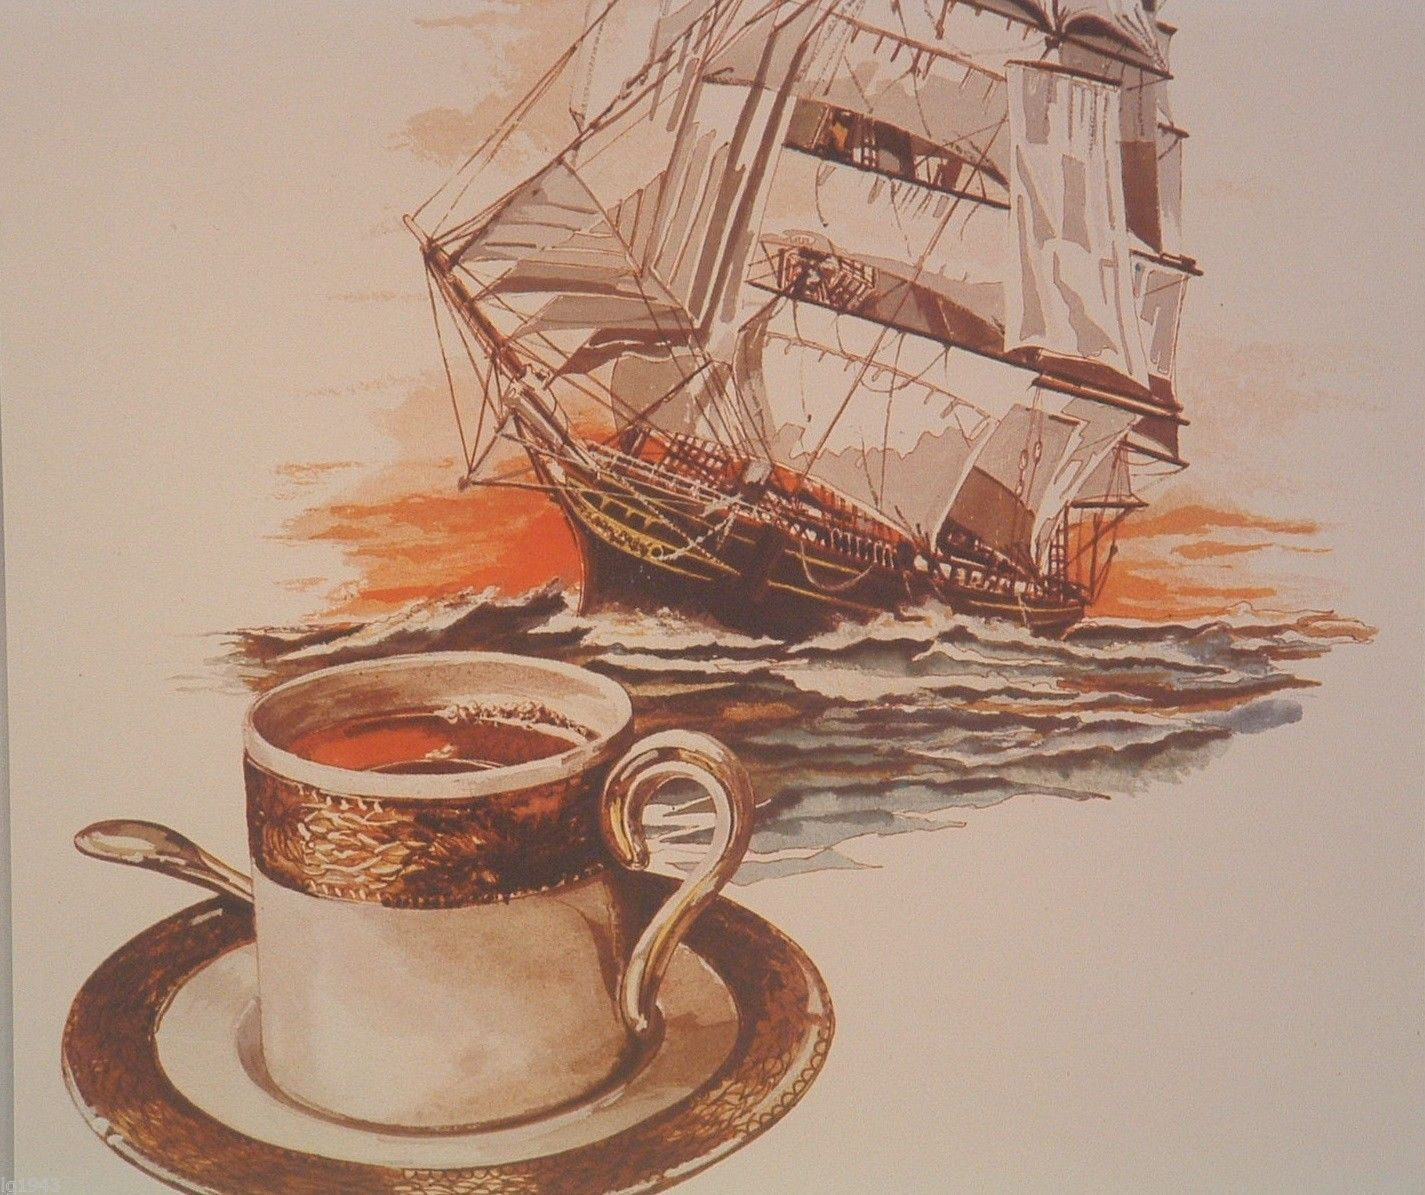 Lenier's Yunnan OP Superior China Black Leaf Tea 3oz Free Shipping